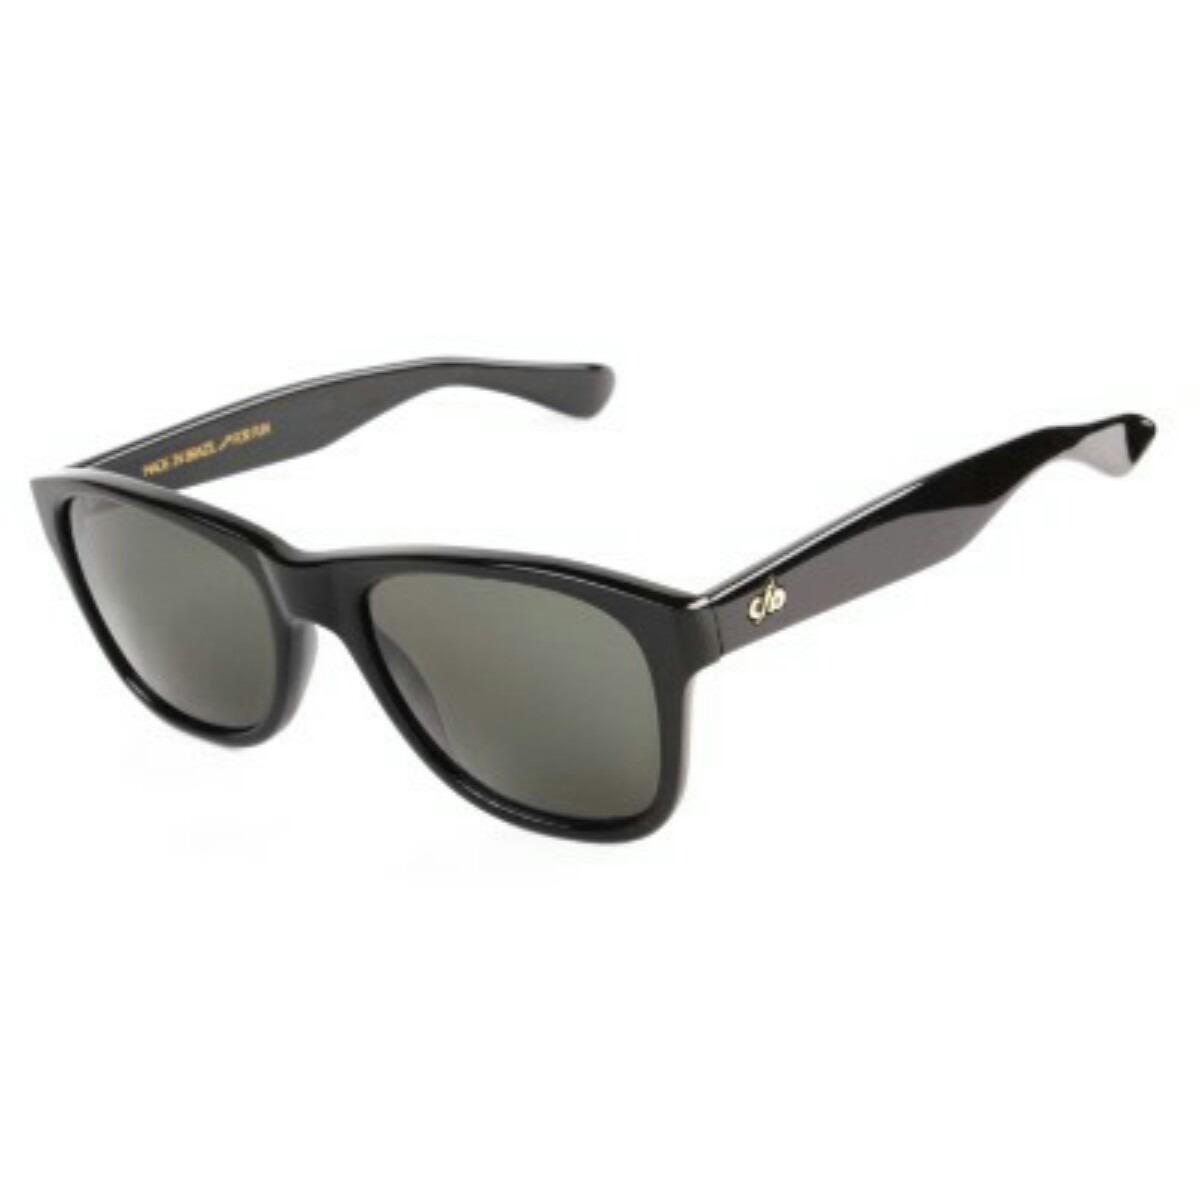 33df160ea5463 Óculos Escuros Masculino Chilli Beans Bossa Nova Preto - R  99,00 em ...